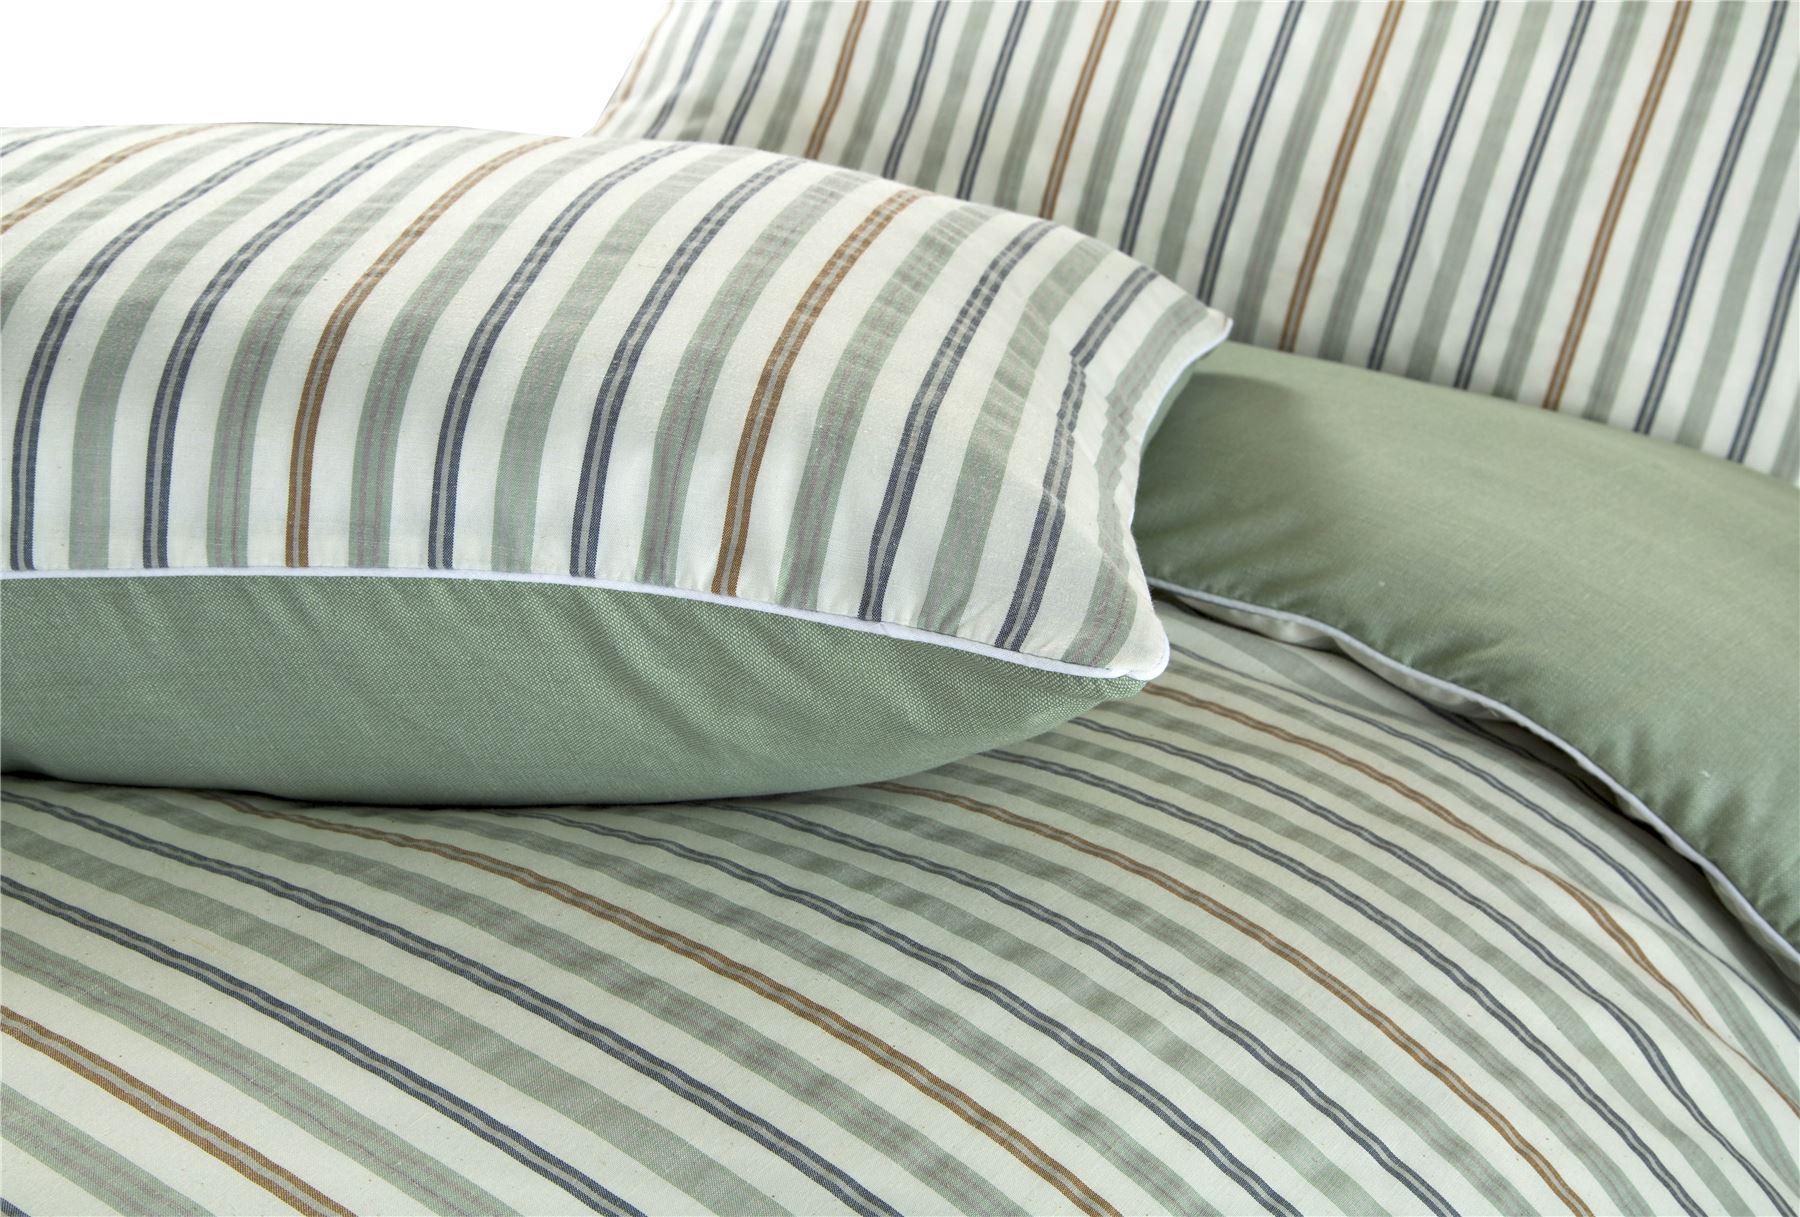 Hilo-de-algodon-de-lujo-Rico-Suave-Chambray-tenido-de-Cubierta-de-edredon-a-rayas-de-tejido-a-rayas miniatura 36